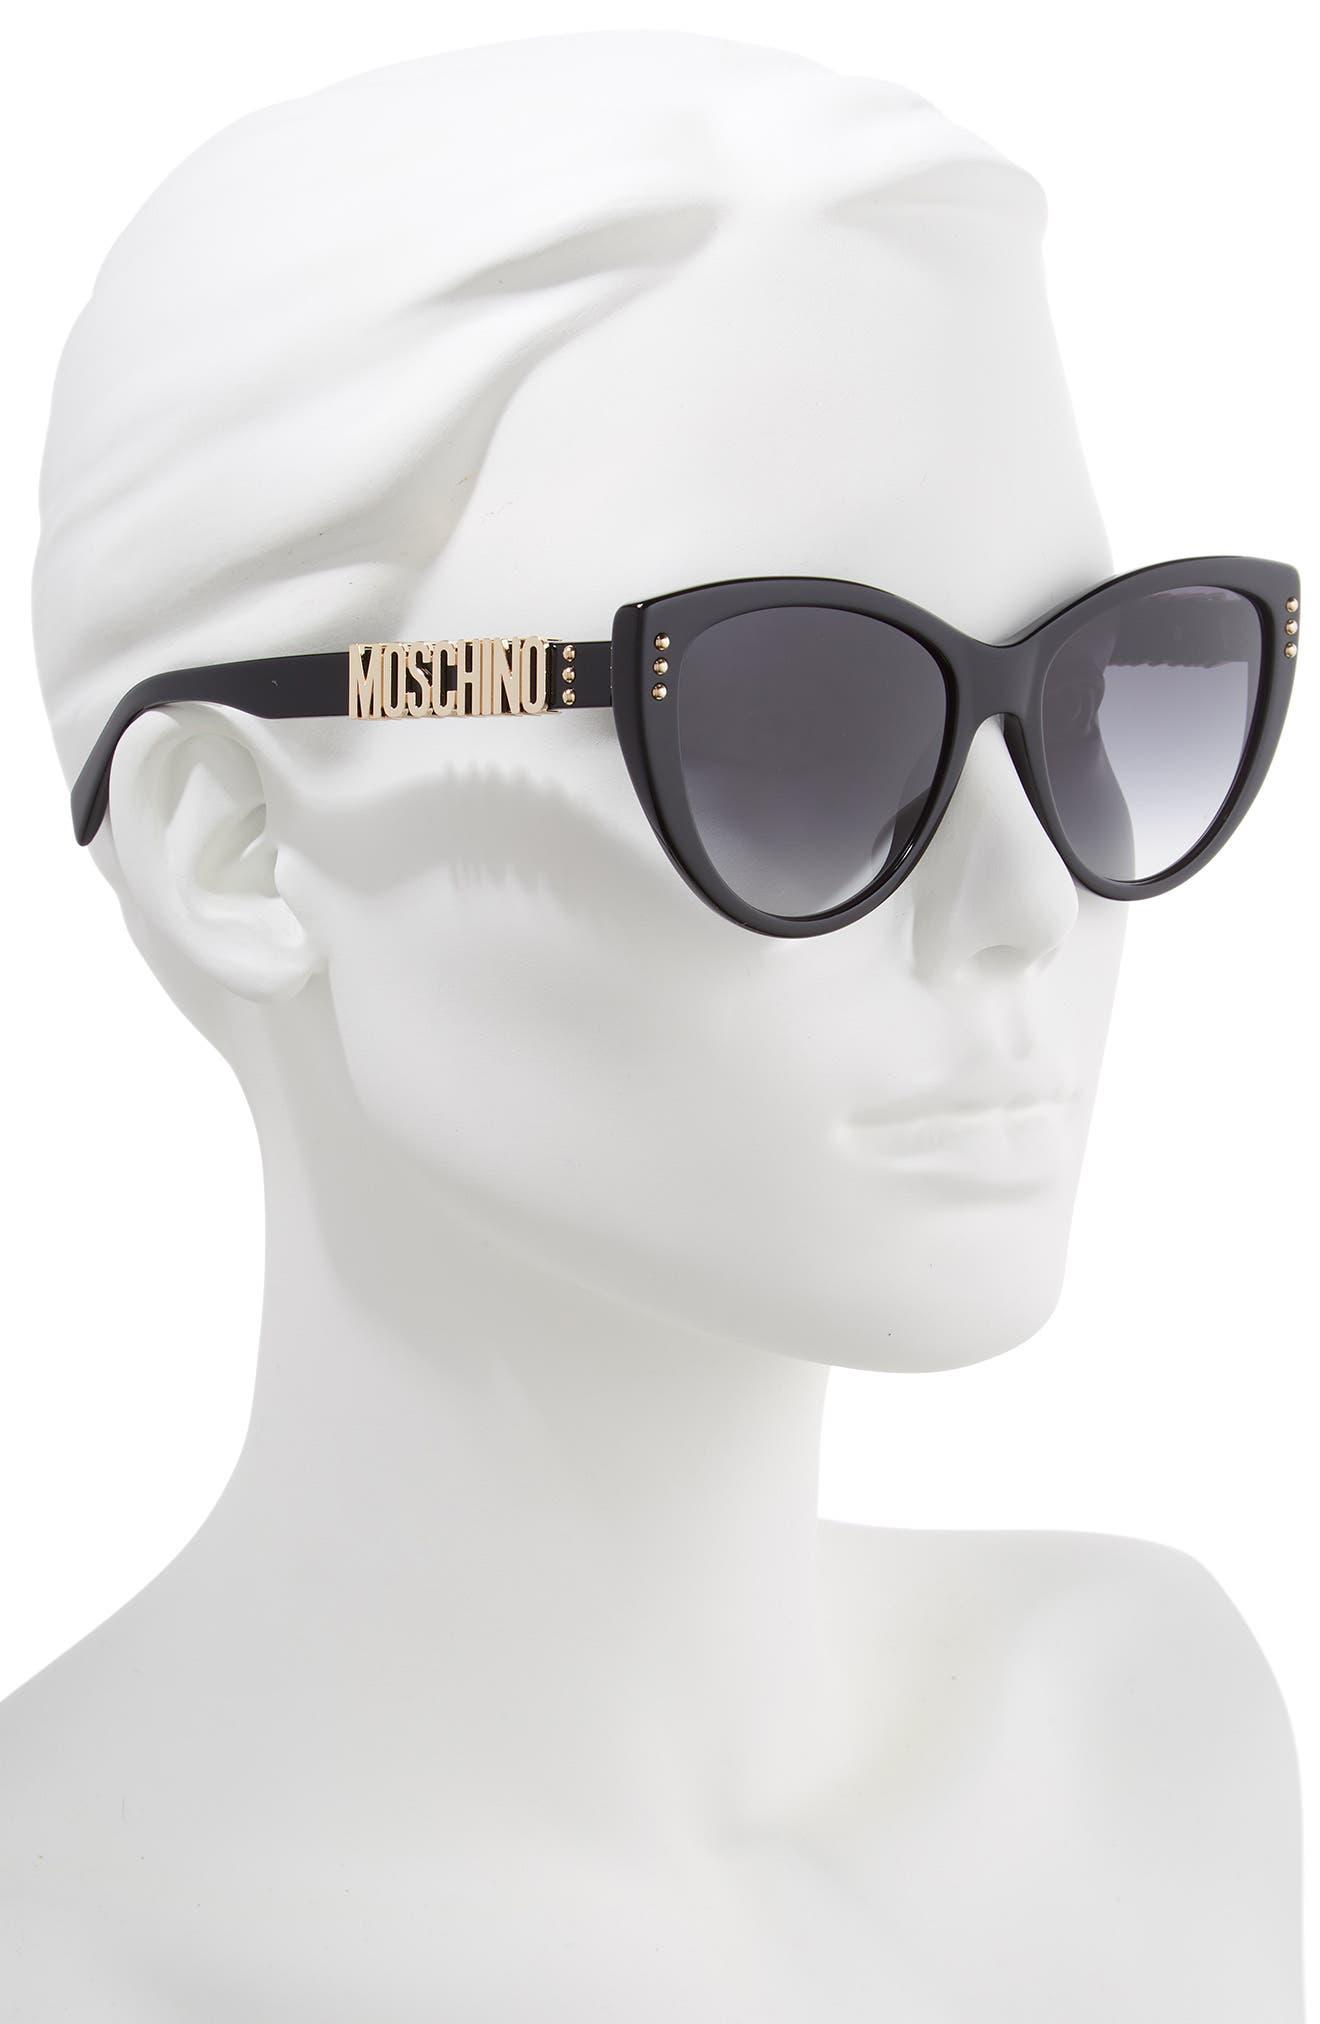 MOSCHINO, 56mm Gradient Cat Eye Sunglasses, Alternate thumbnail 2, color, BLACK